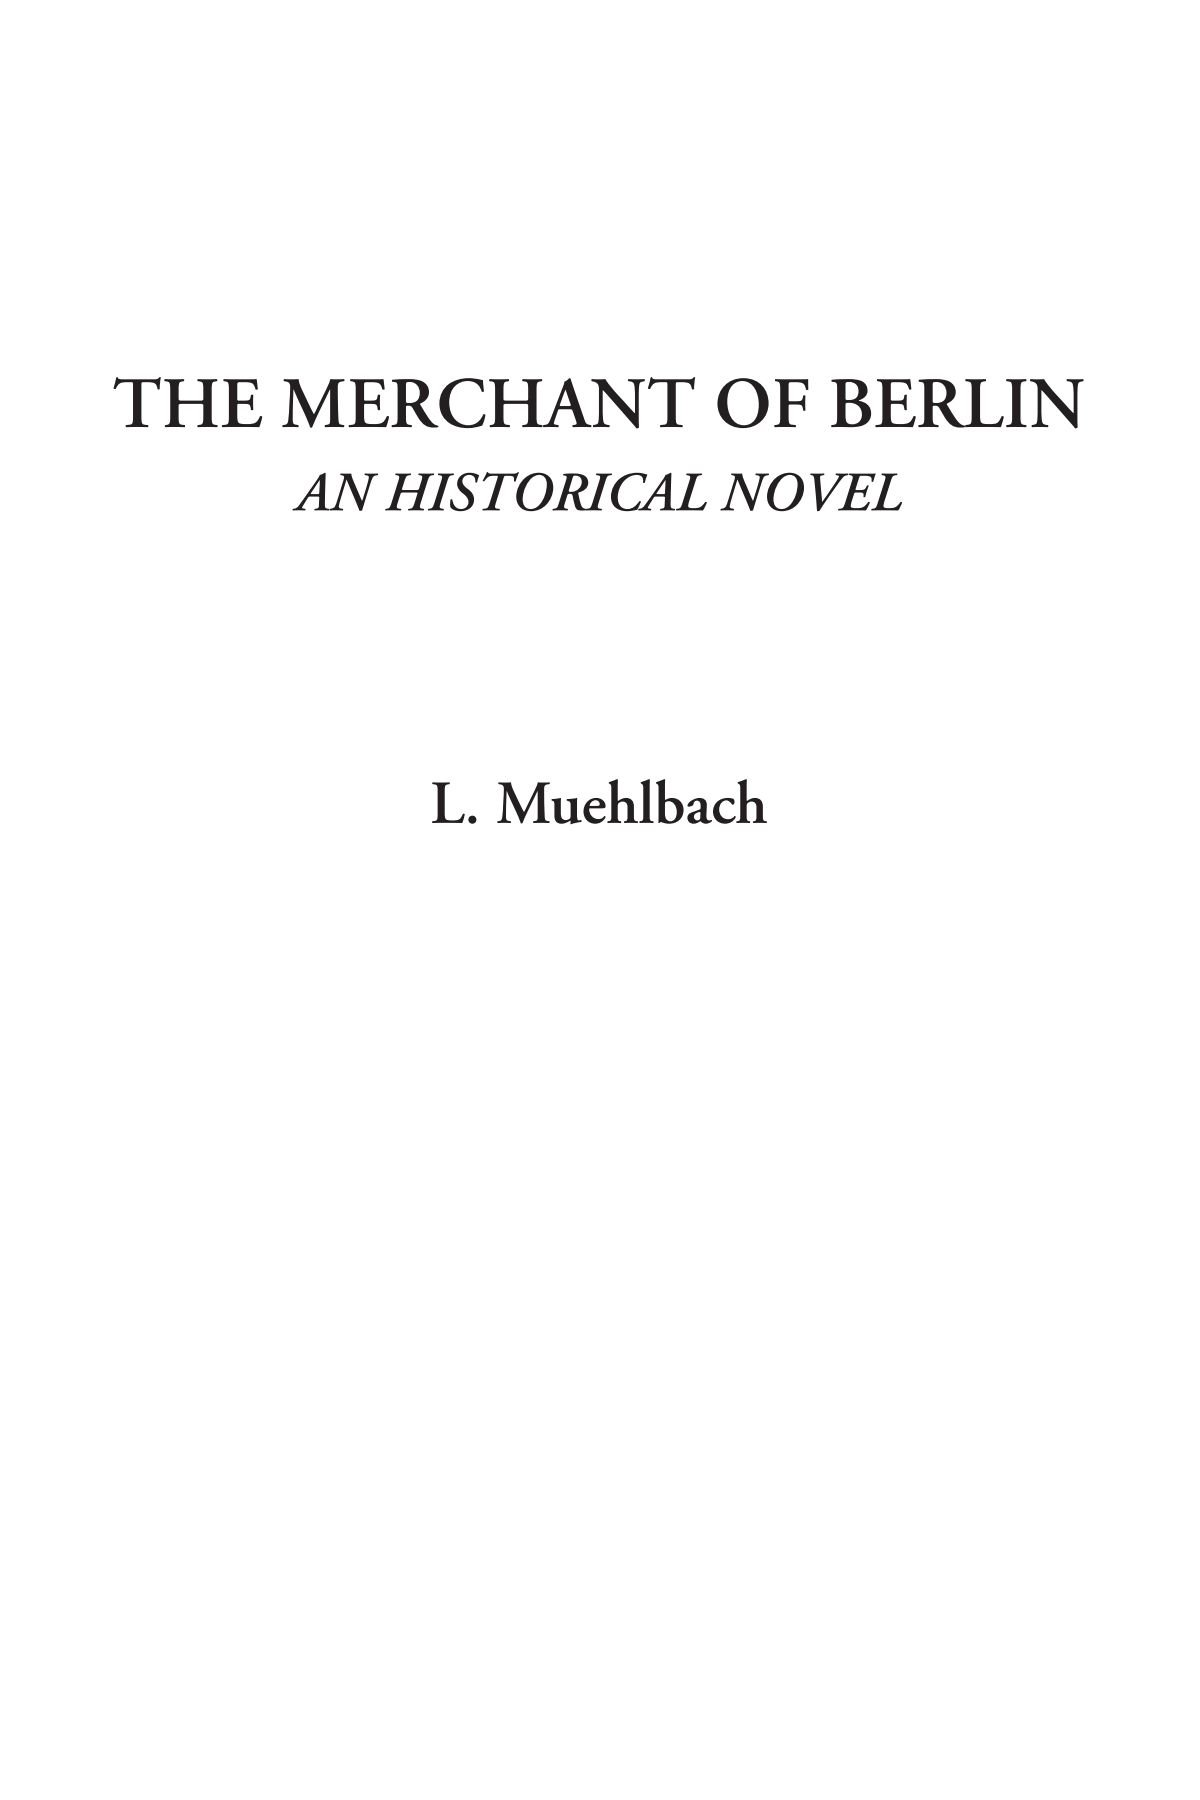 Download The Merchant of Berlin (An Historical Novel) pdf